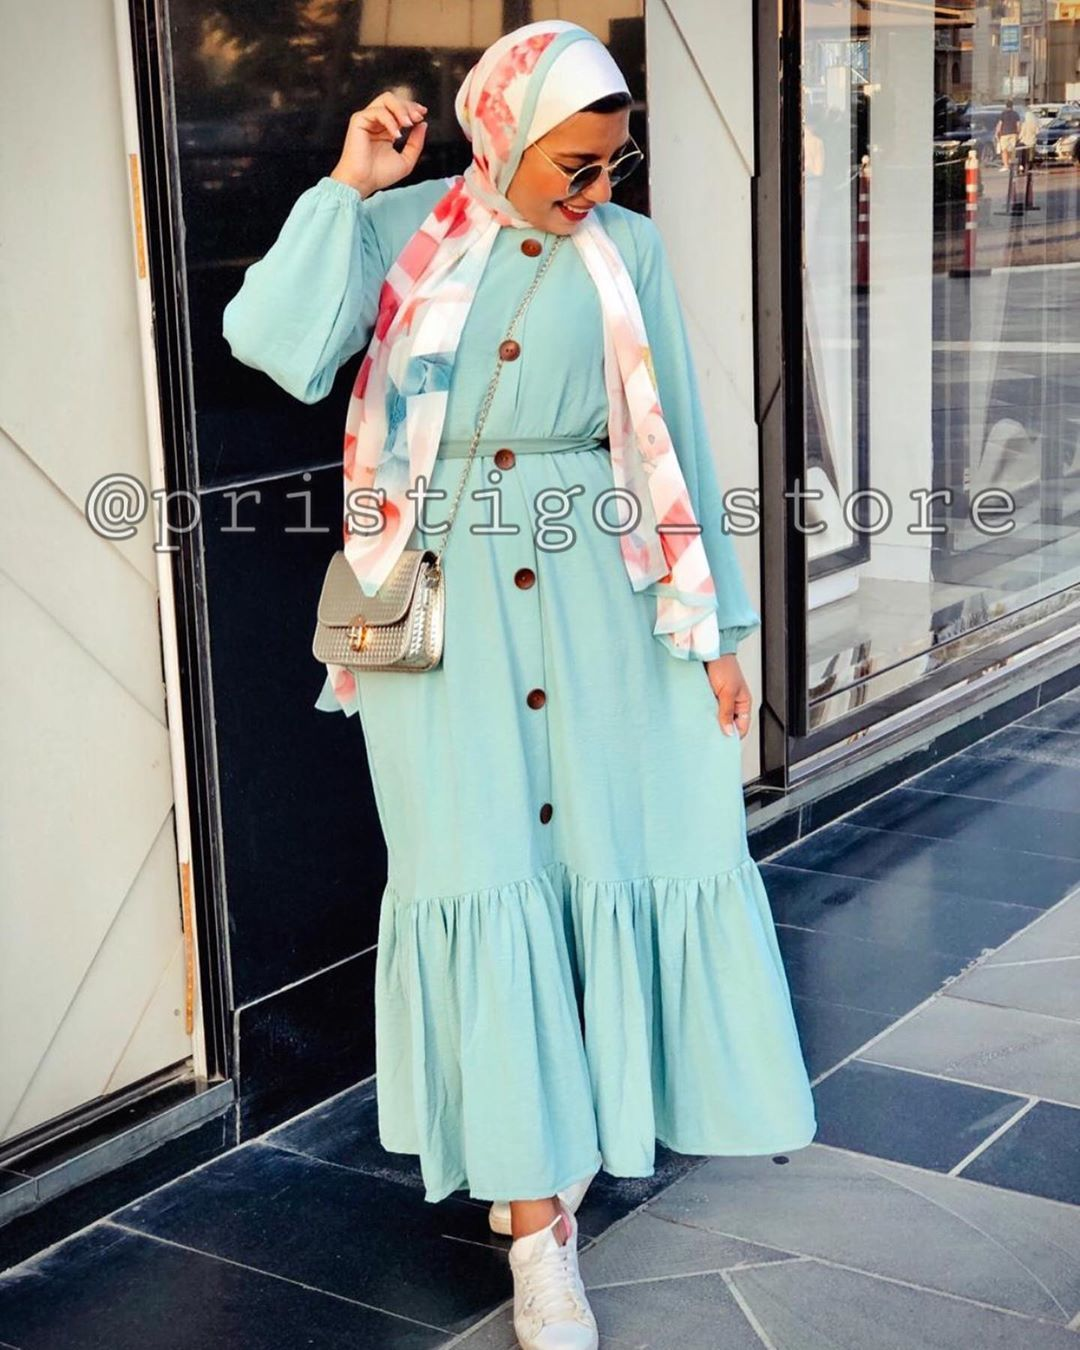 Pristigo On Instagram New Color Of Dress متاح الفستان ب٦ الوان هافان ابيض اسود كشمير اصفر منت جرين متوفر بجميع Fashion How To Wear Hijab